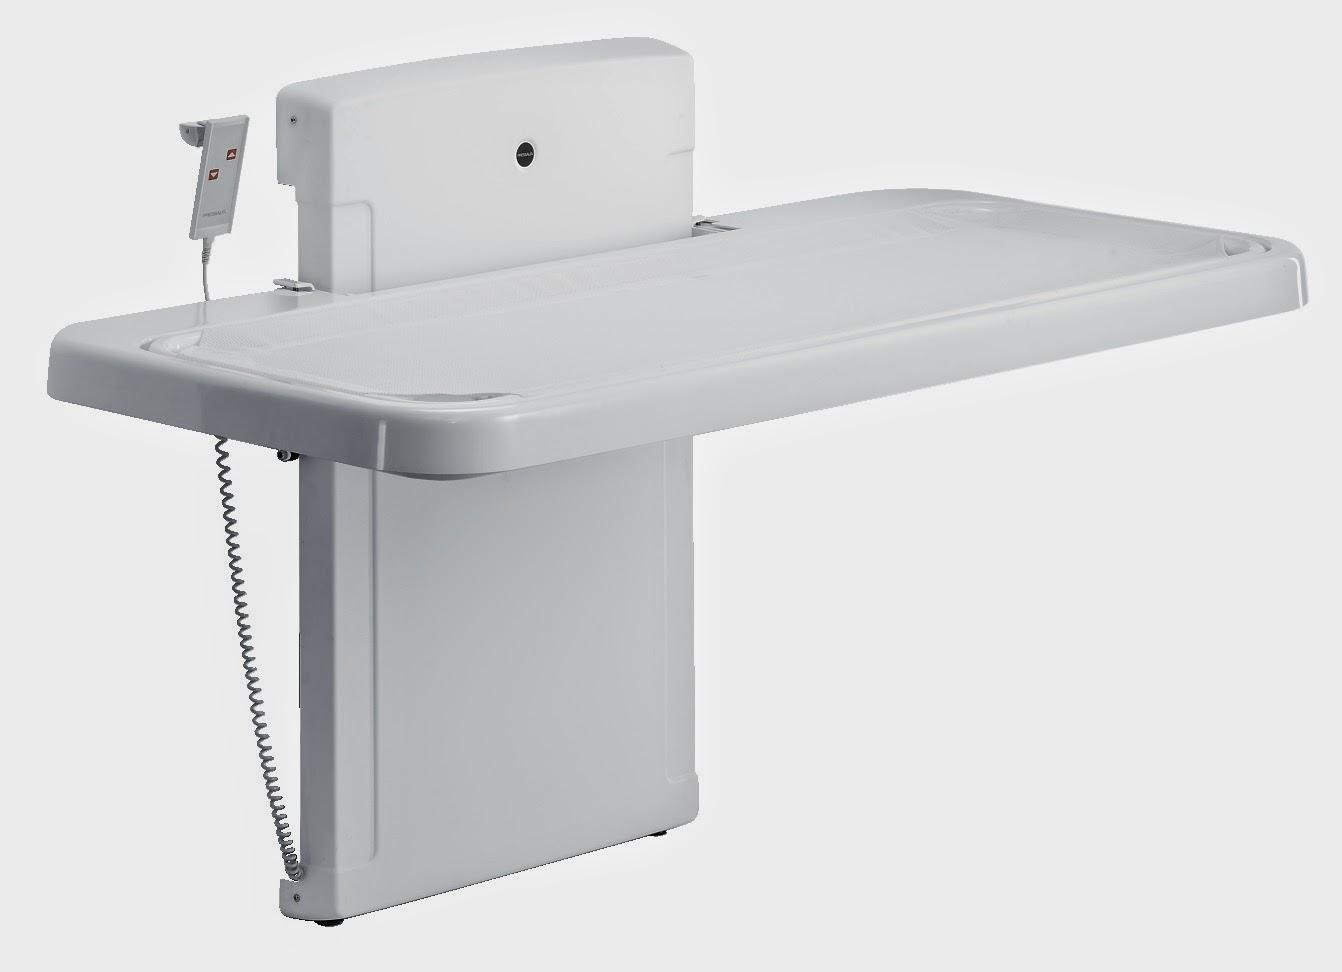 Powered nursing benches 2000 - R8468000